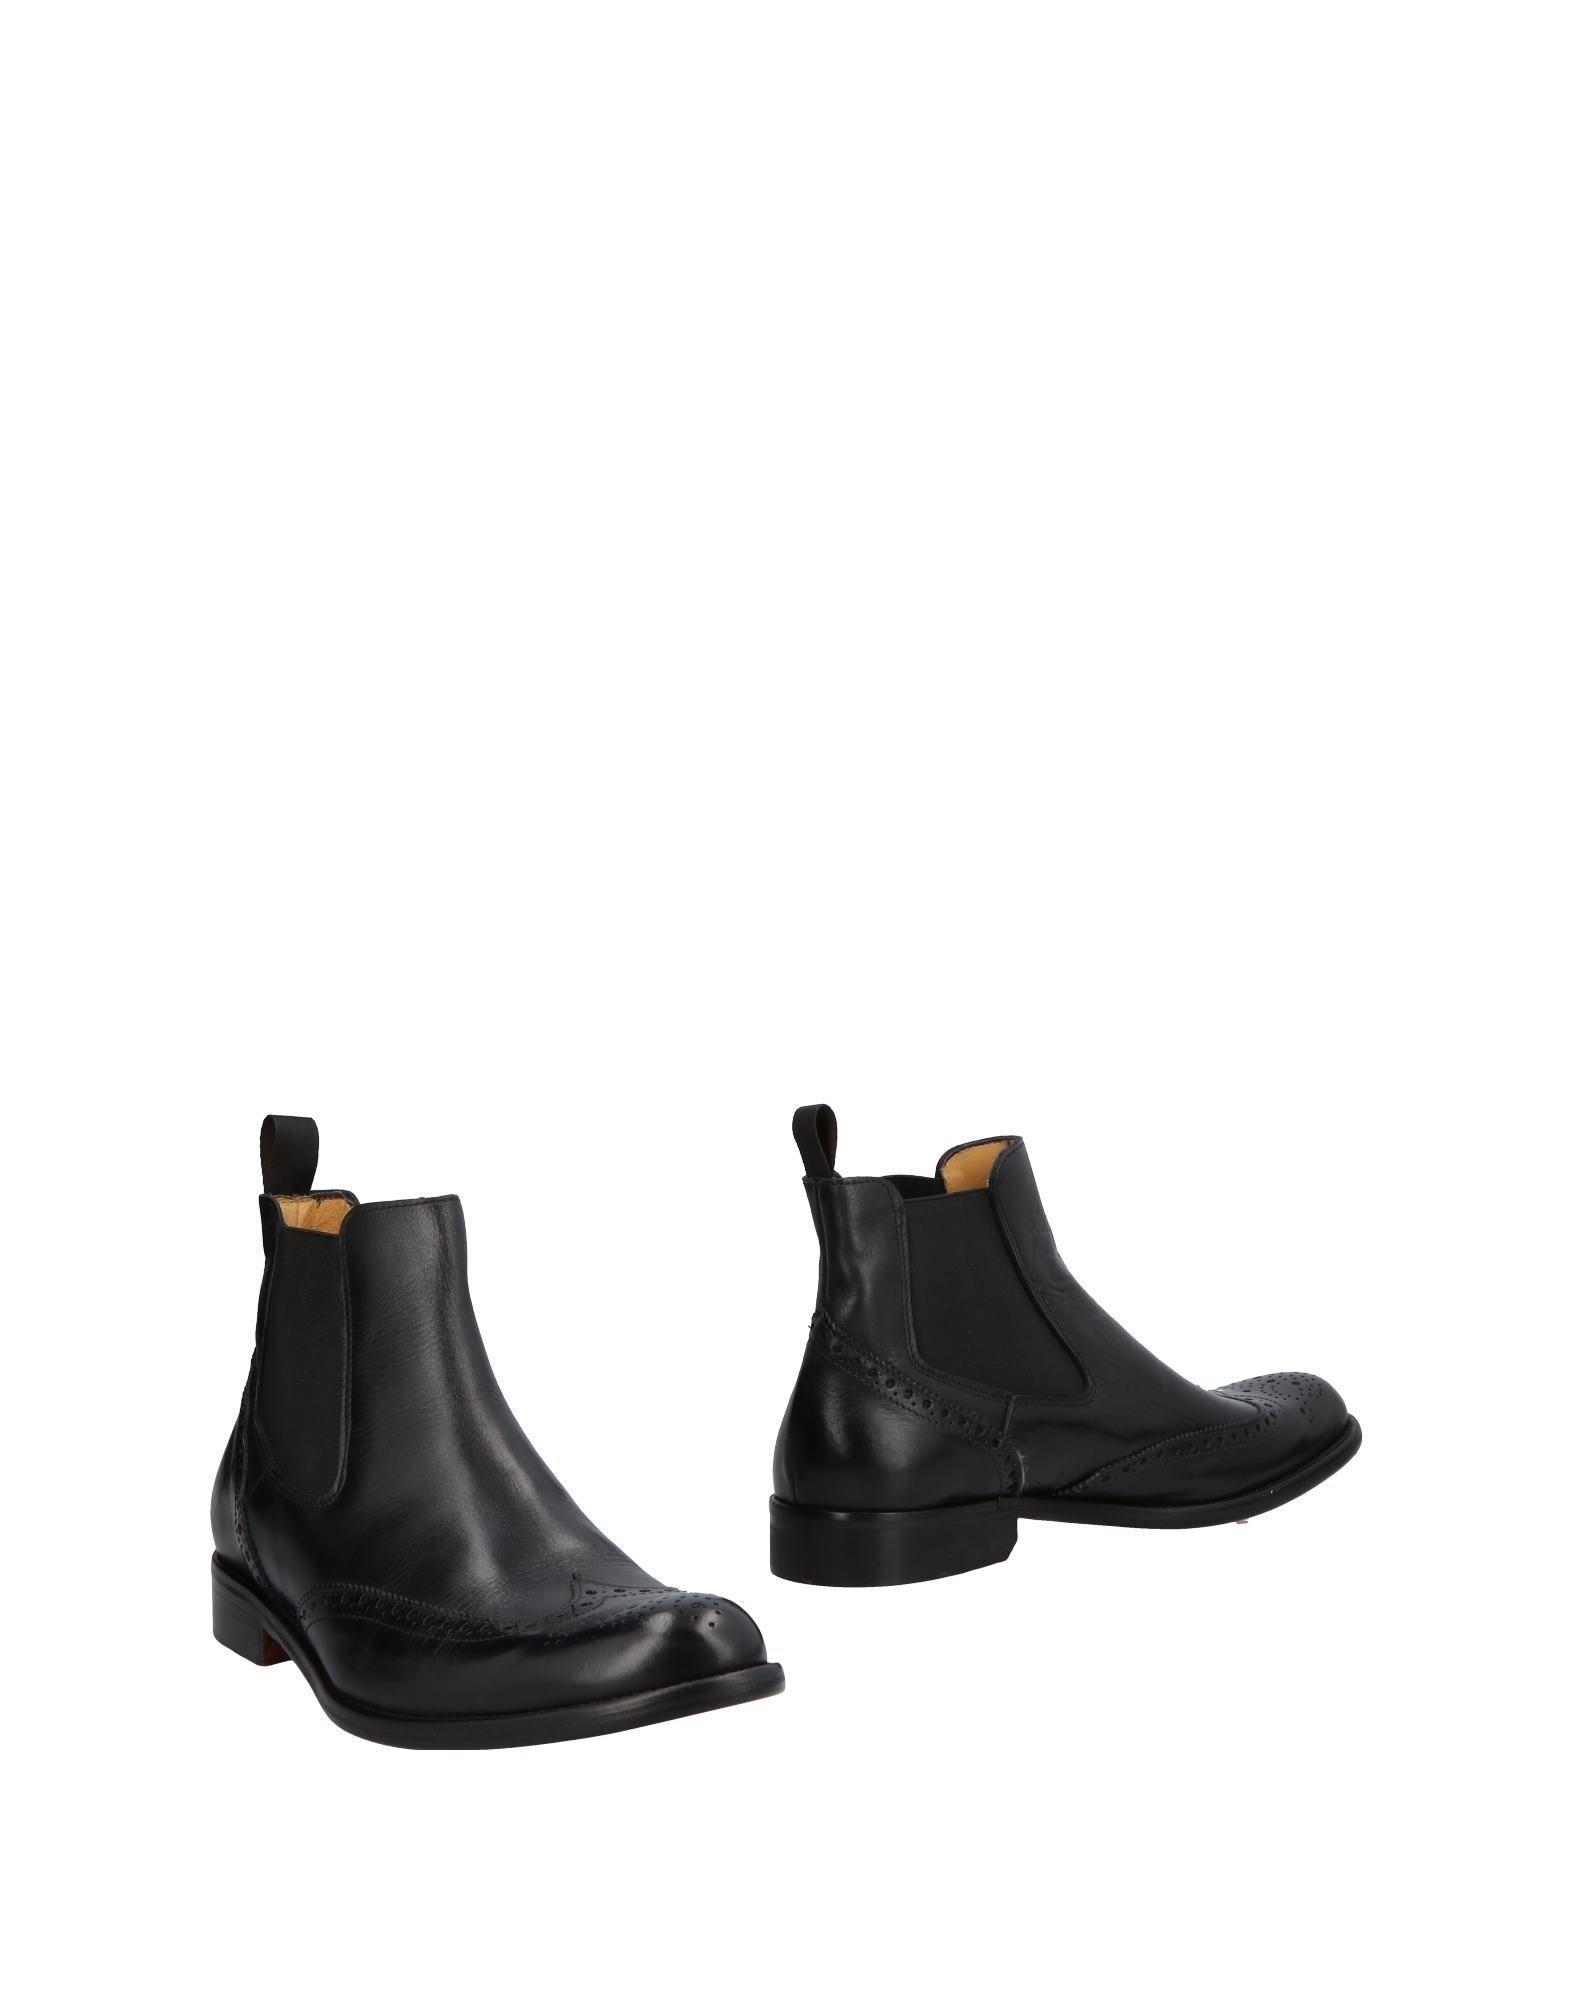 Rabatt echte Schuhe Il Calzolaio 11475455QW Stiefelette Herren  11475455QW Calzolaio 944509